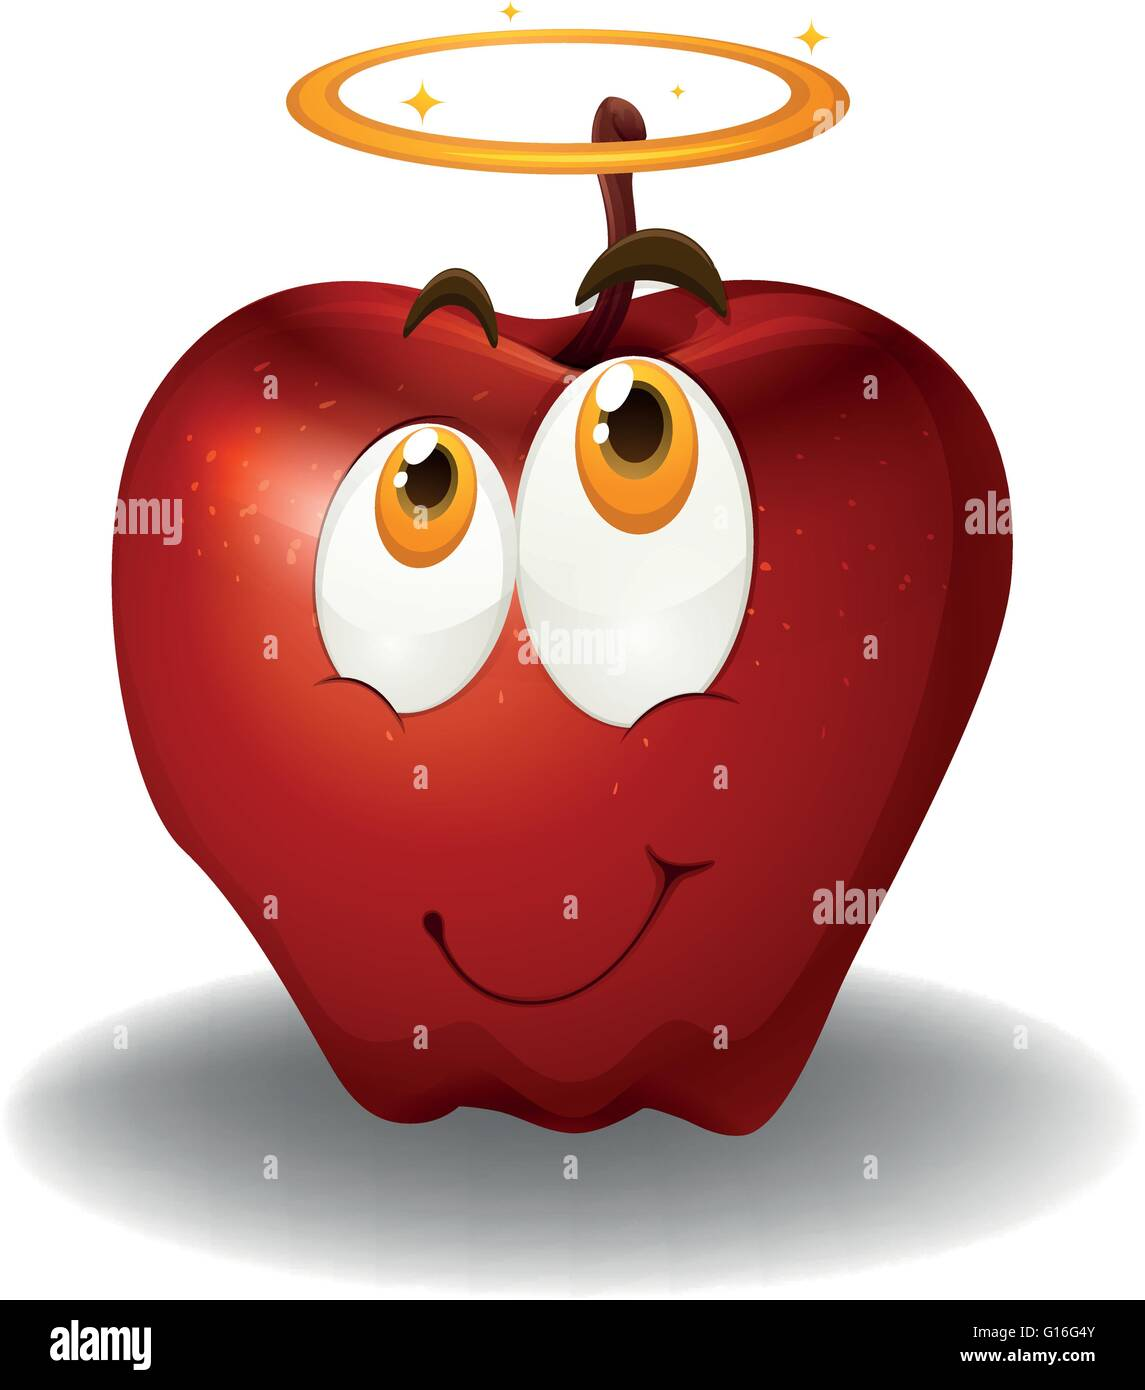 Roter Apfel mit Smiley-illustration Stockbild